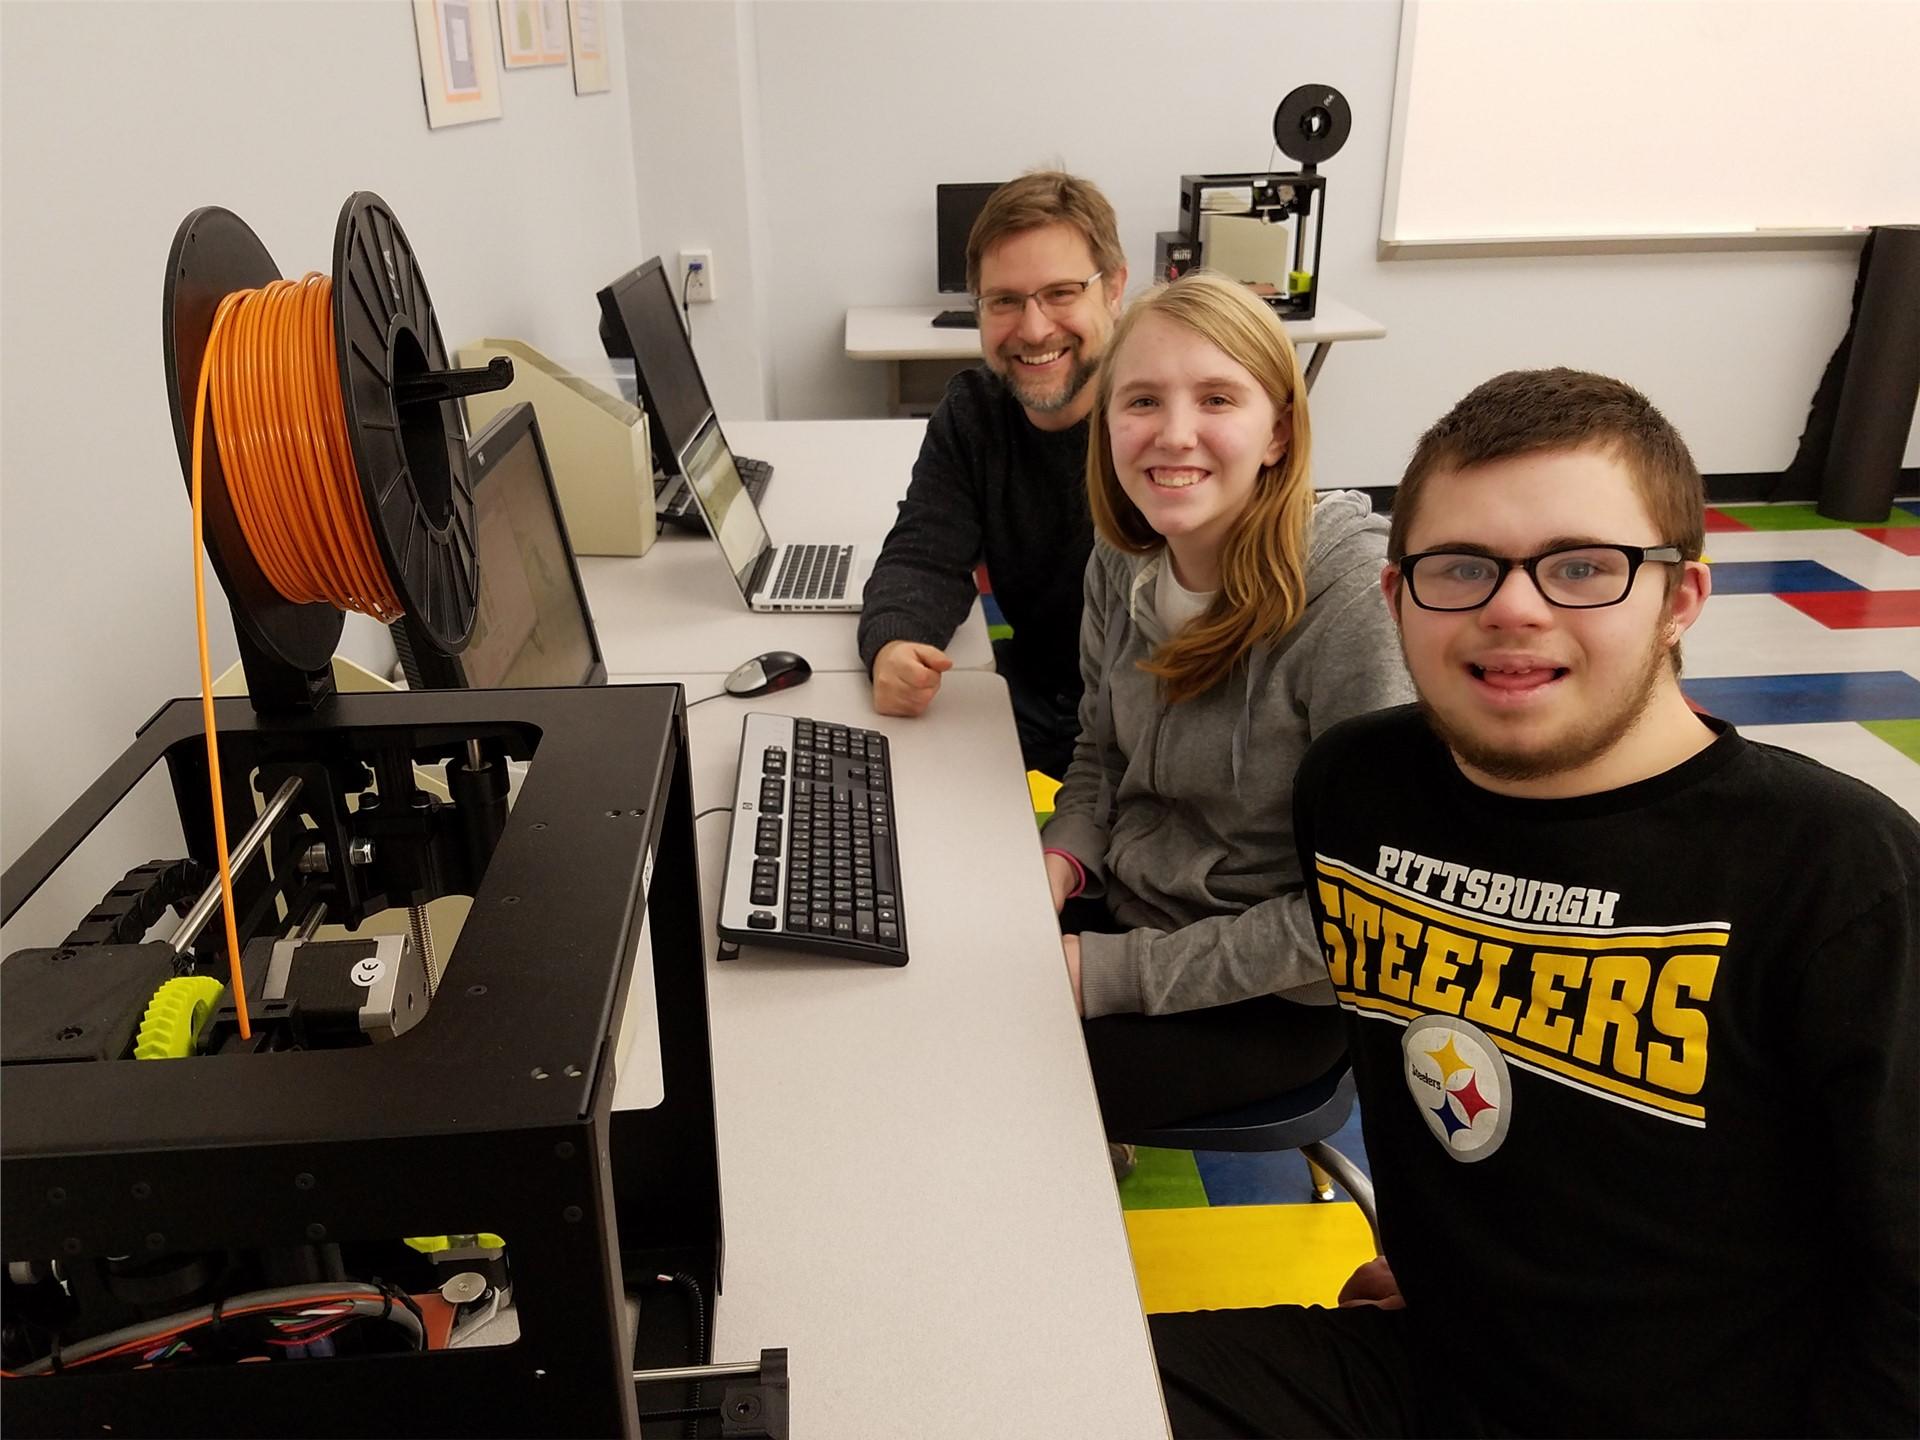 Mr. Staranko's students 3D printing